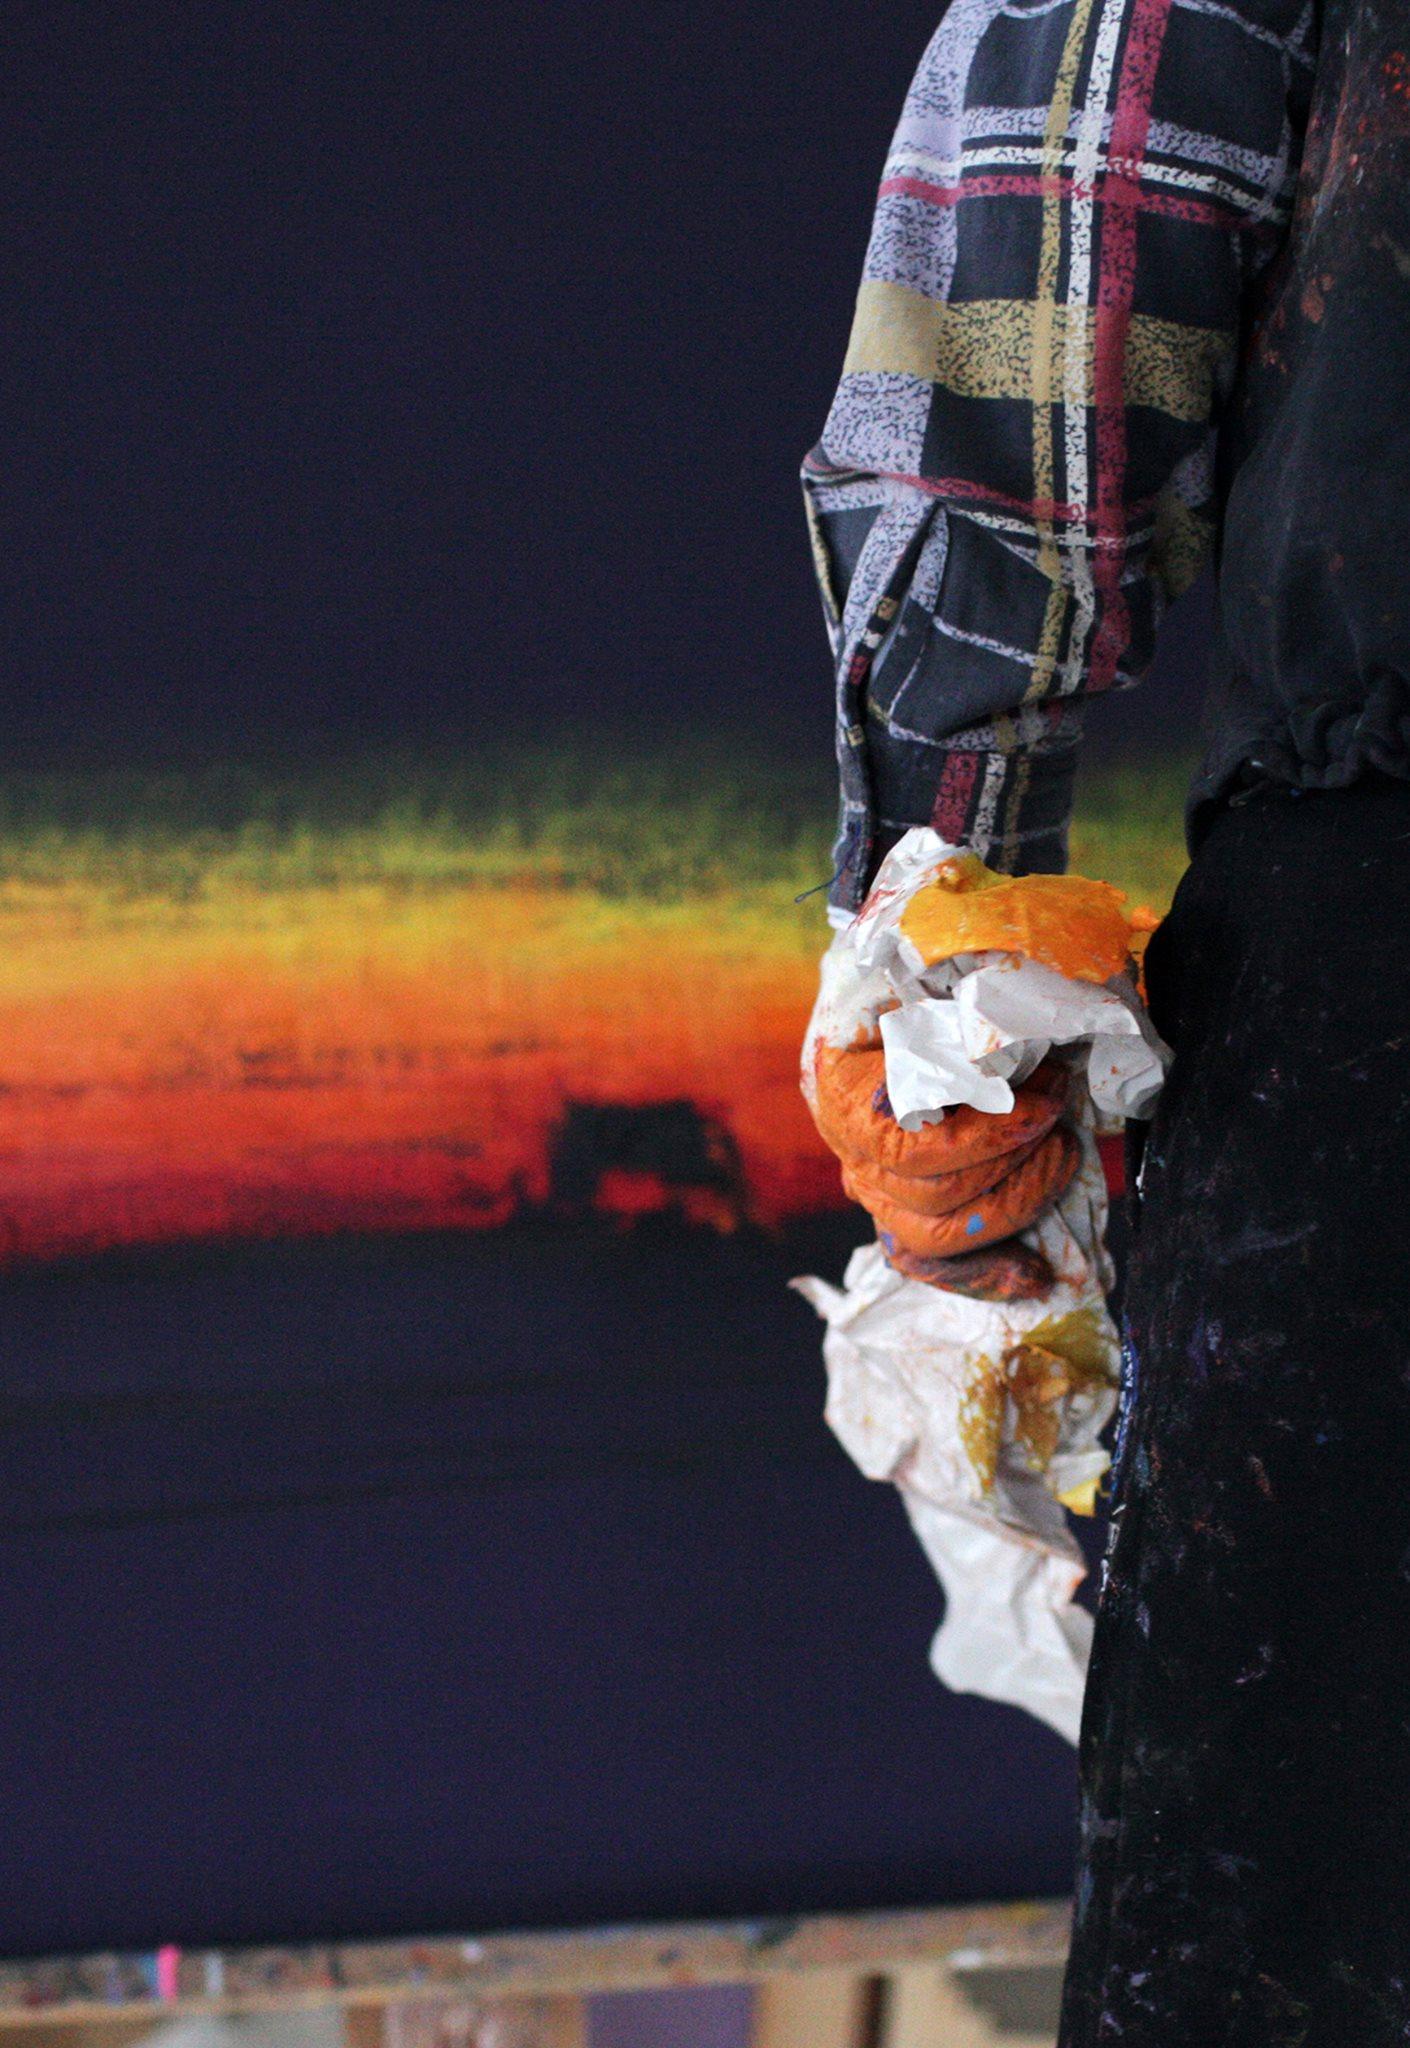 11-saponova-photography-art-kryvolap-saponova-krivolap